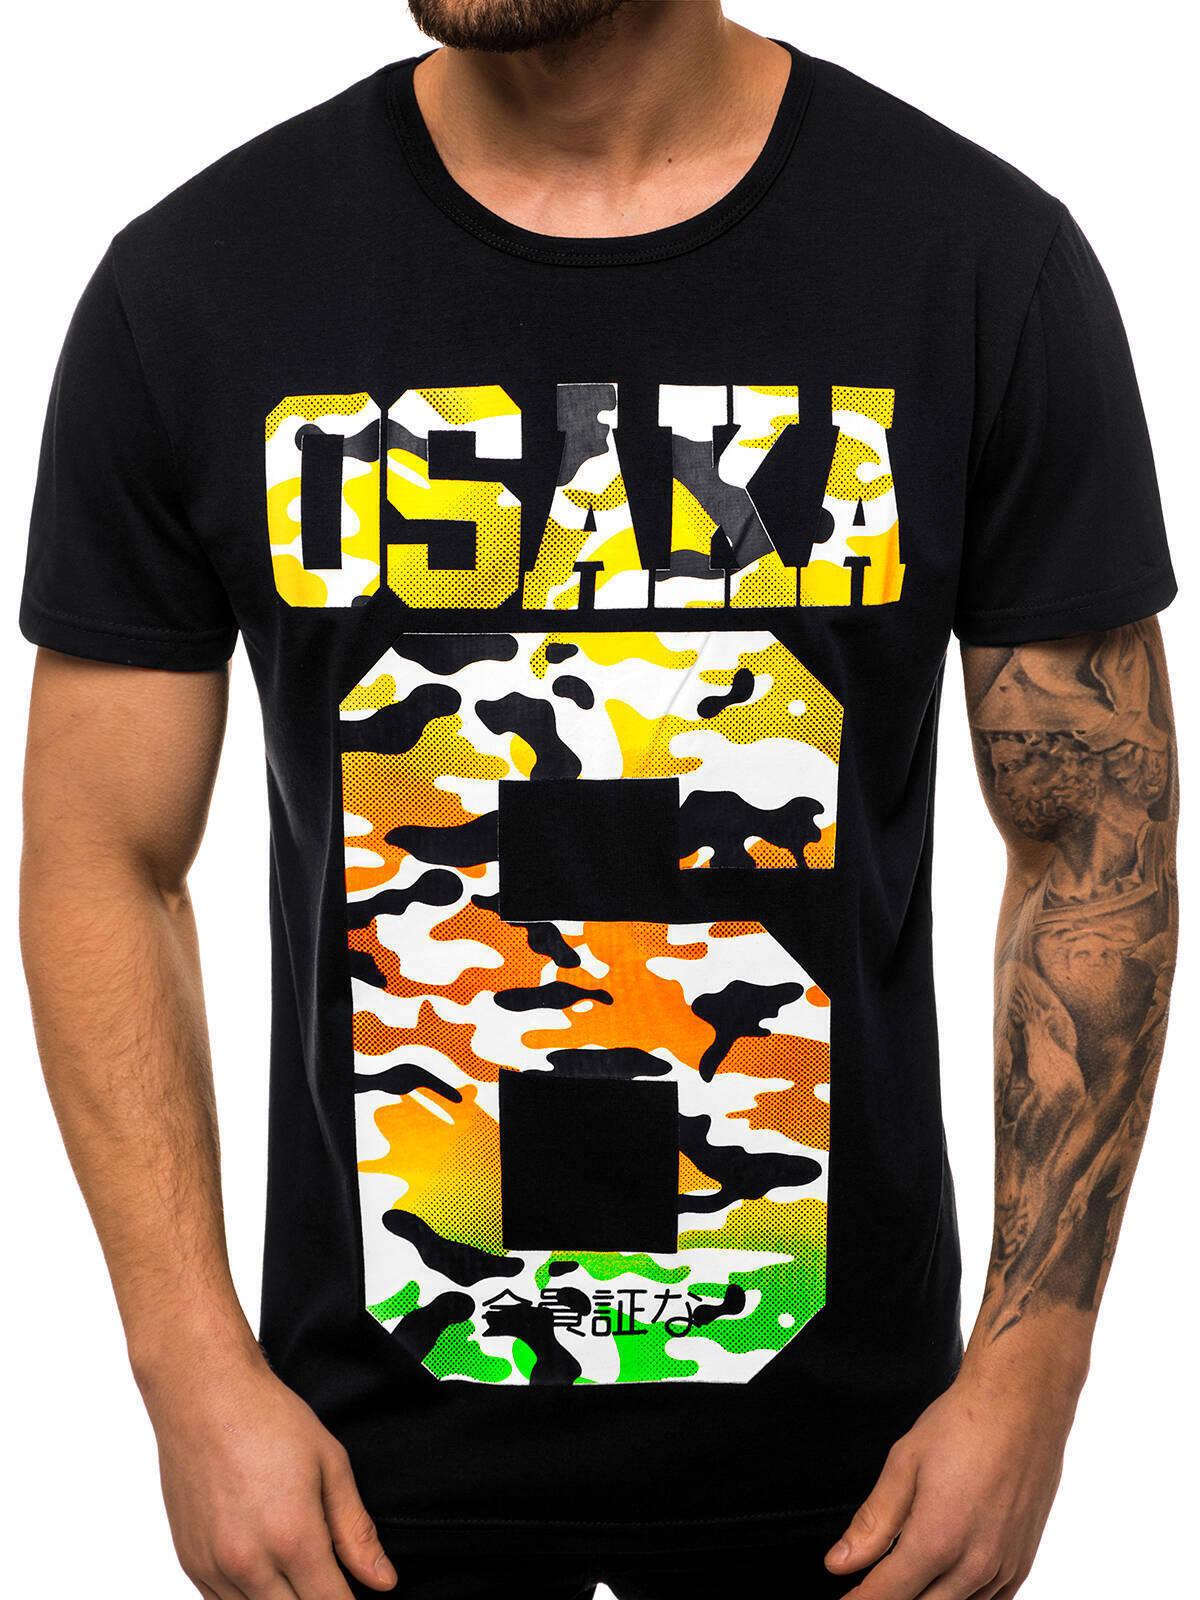 Indexbild 29 - T-Shirt Kurzarm Print Aufdruck Fitness Jogging Sport Shirt Herren OZONEE 12511